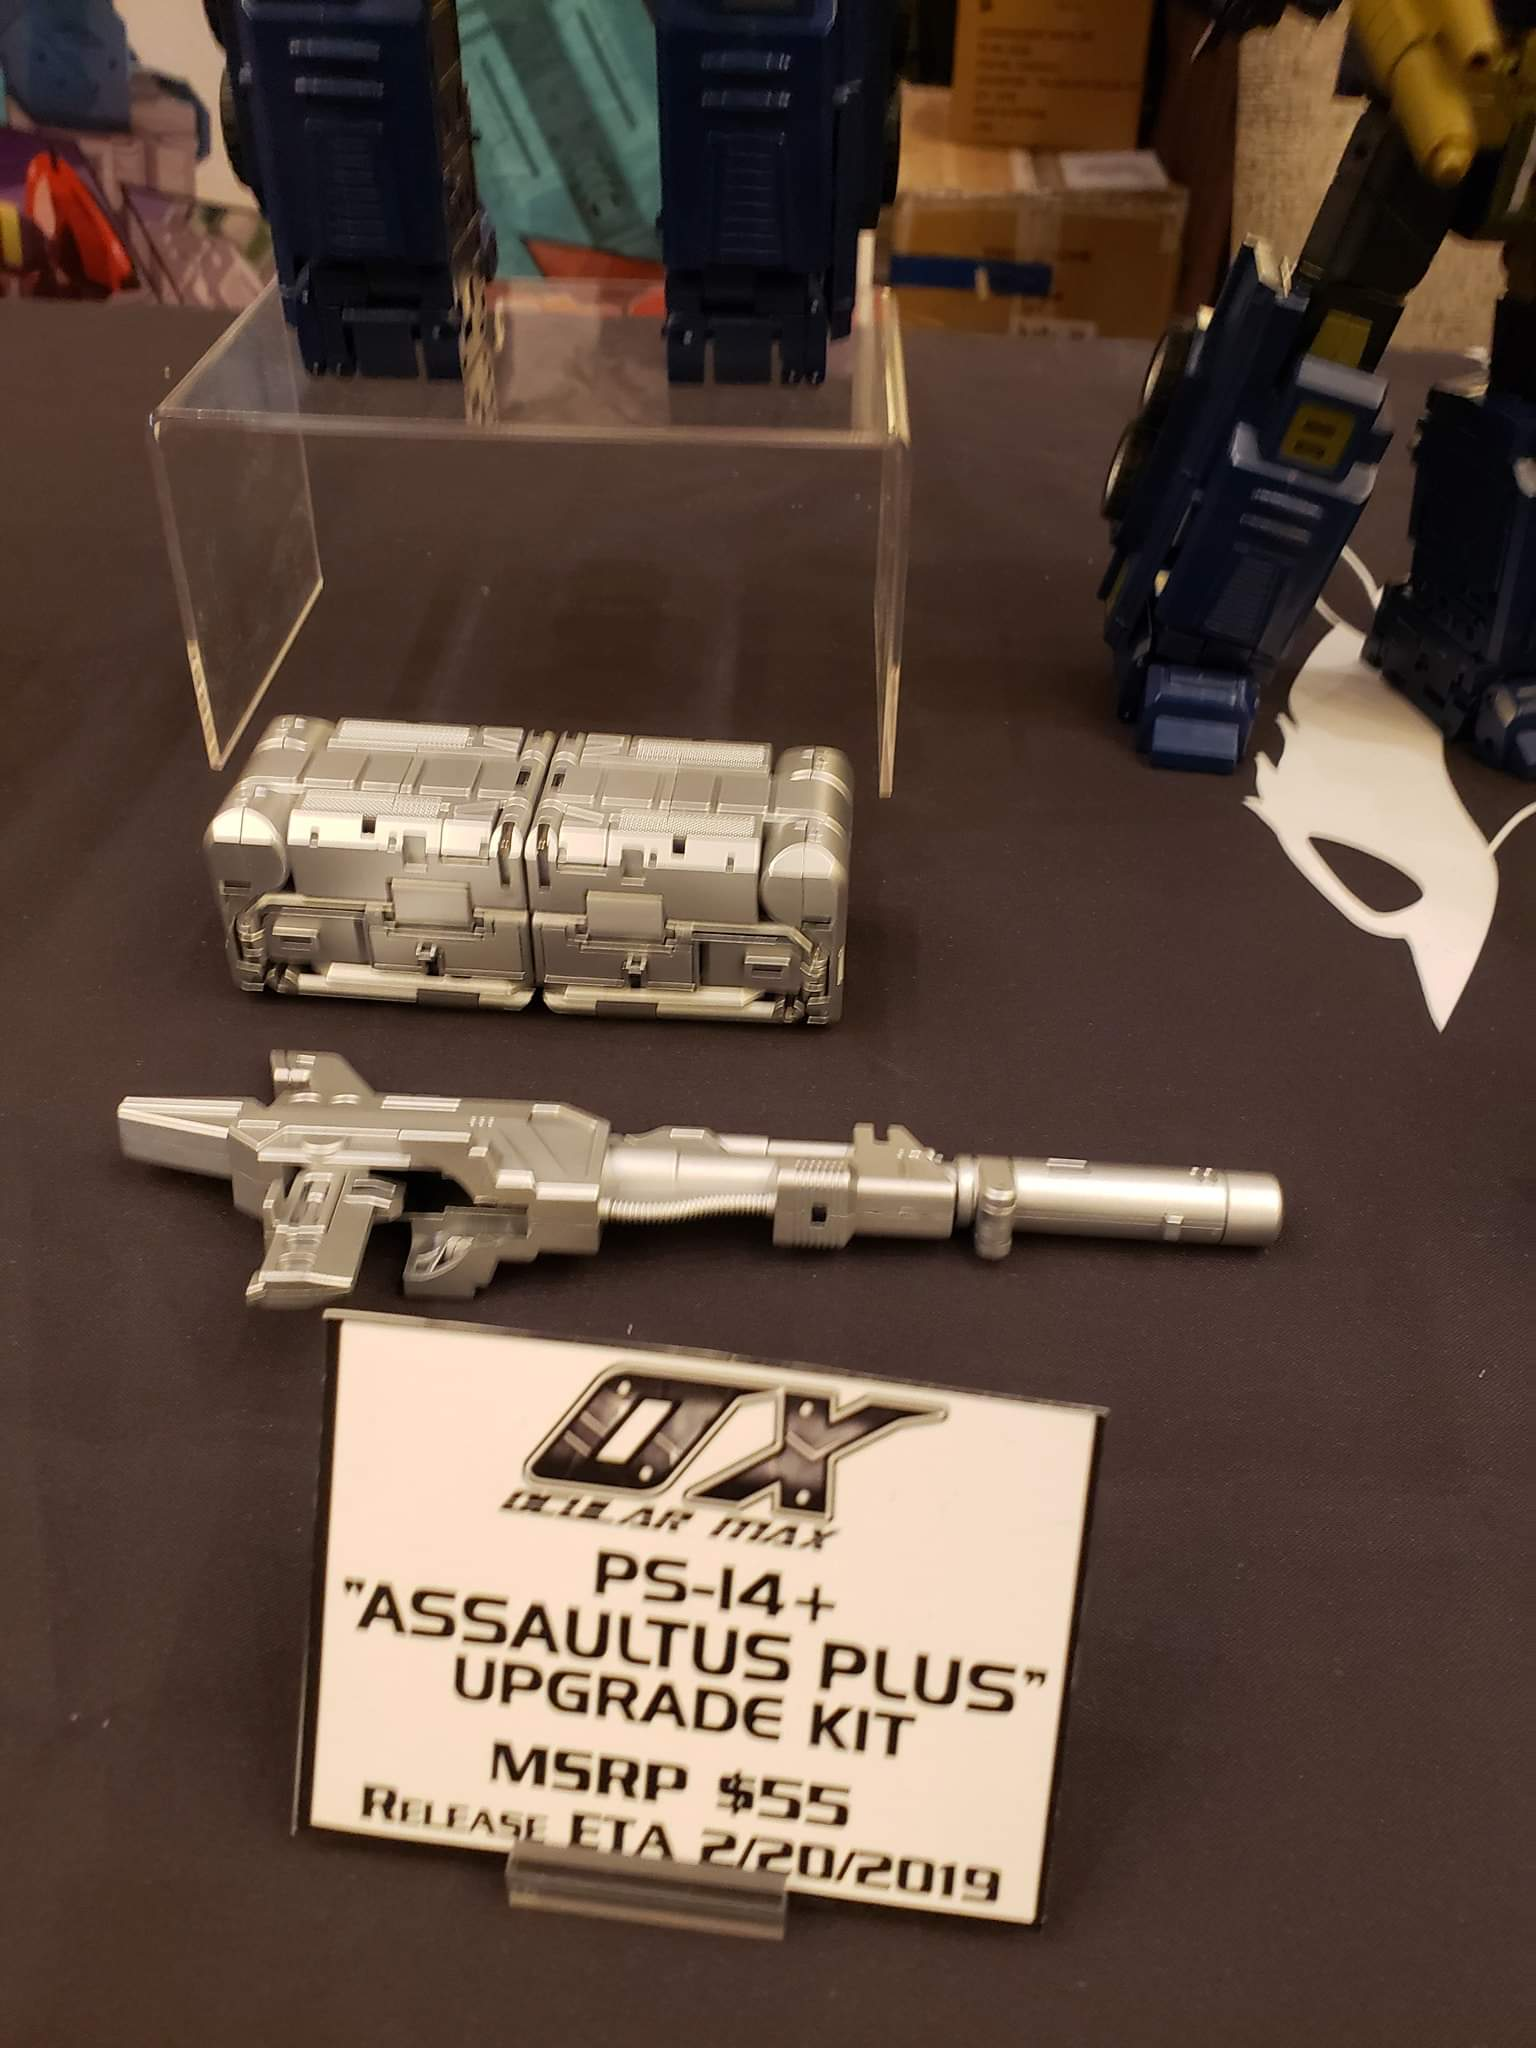 [Ocular Max] Produit Tiers - Jouet Assaultus (PS-13 à PS-17 Assaultus Malitia) - aka Bruticus - Page 4 POlIWWfZ_o